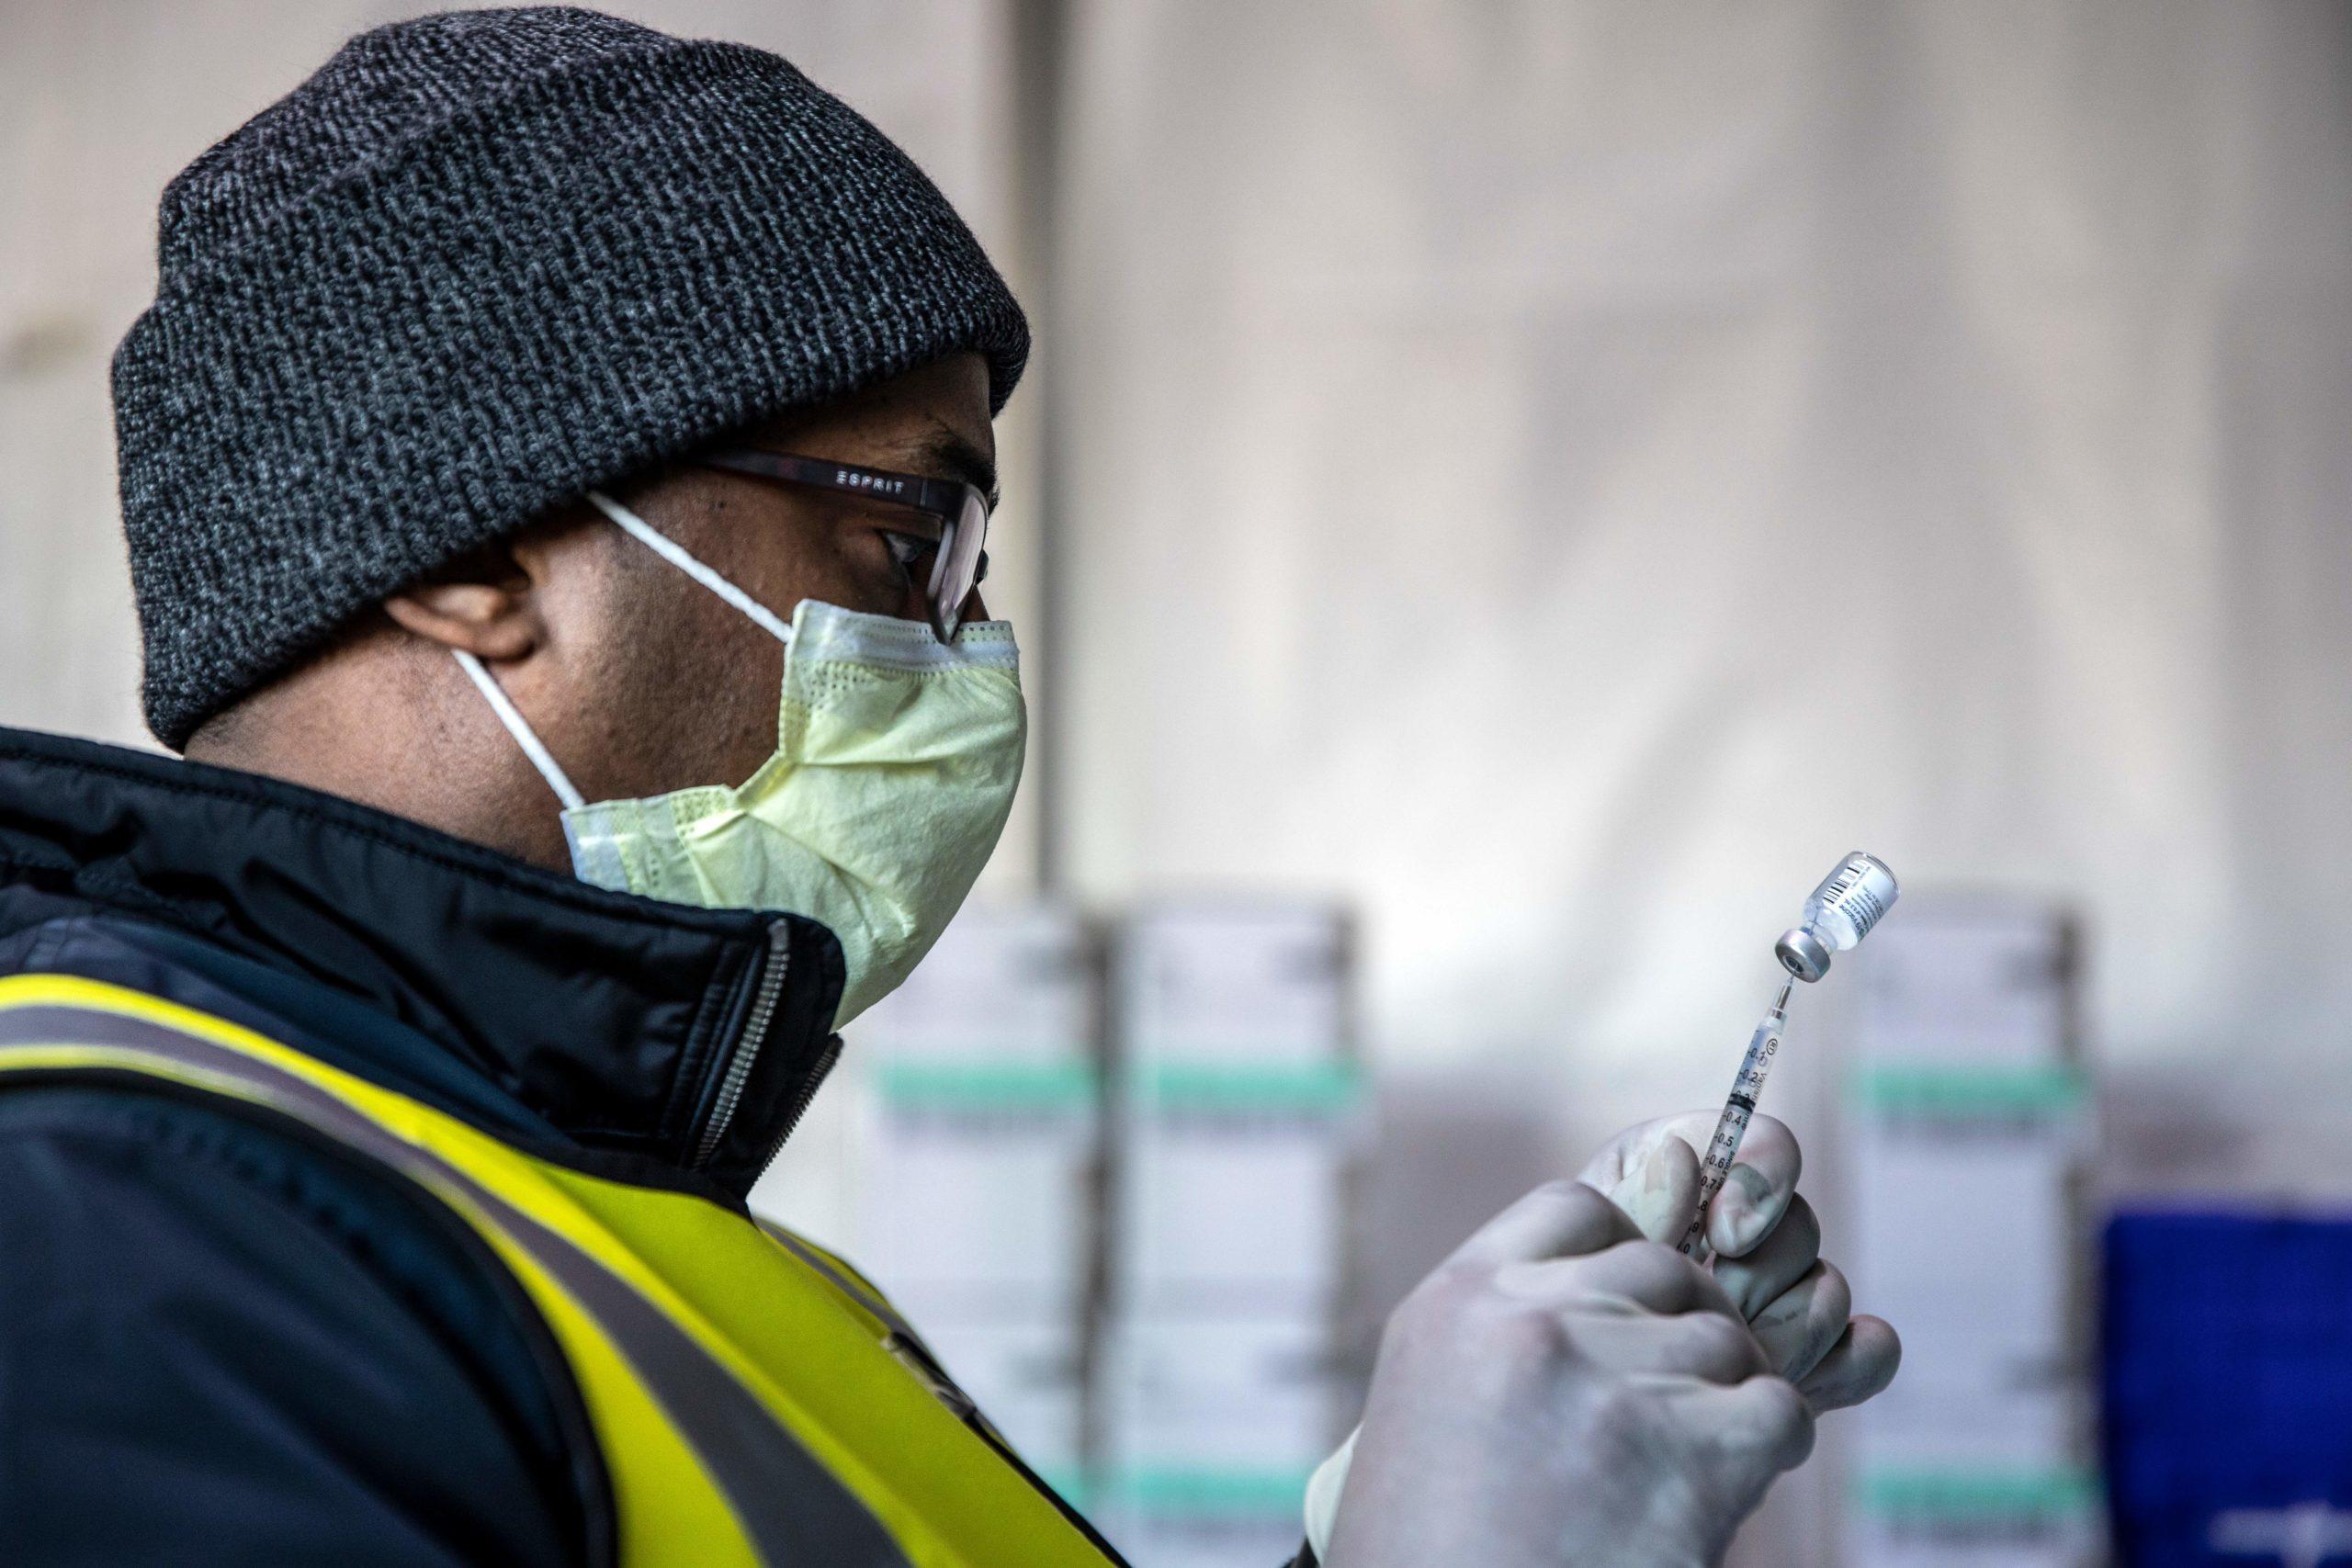 Workers prepare coronavirus vaccines at Coors Field on Saturday in Denver, Colorado. (Chet Strange/AFP via Getty Images)